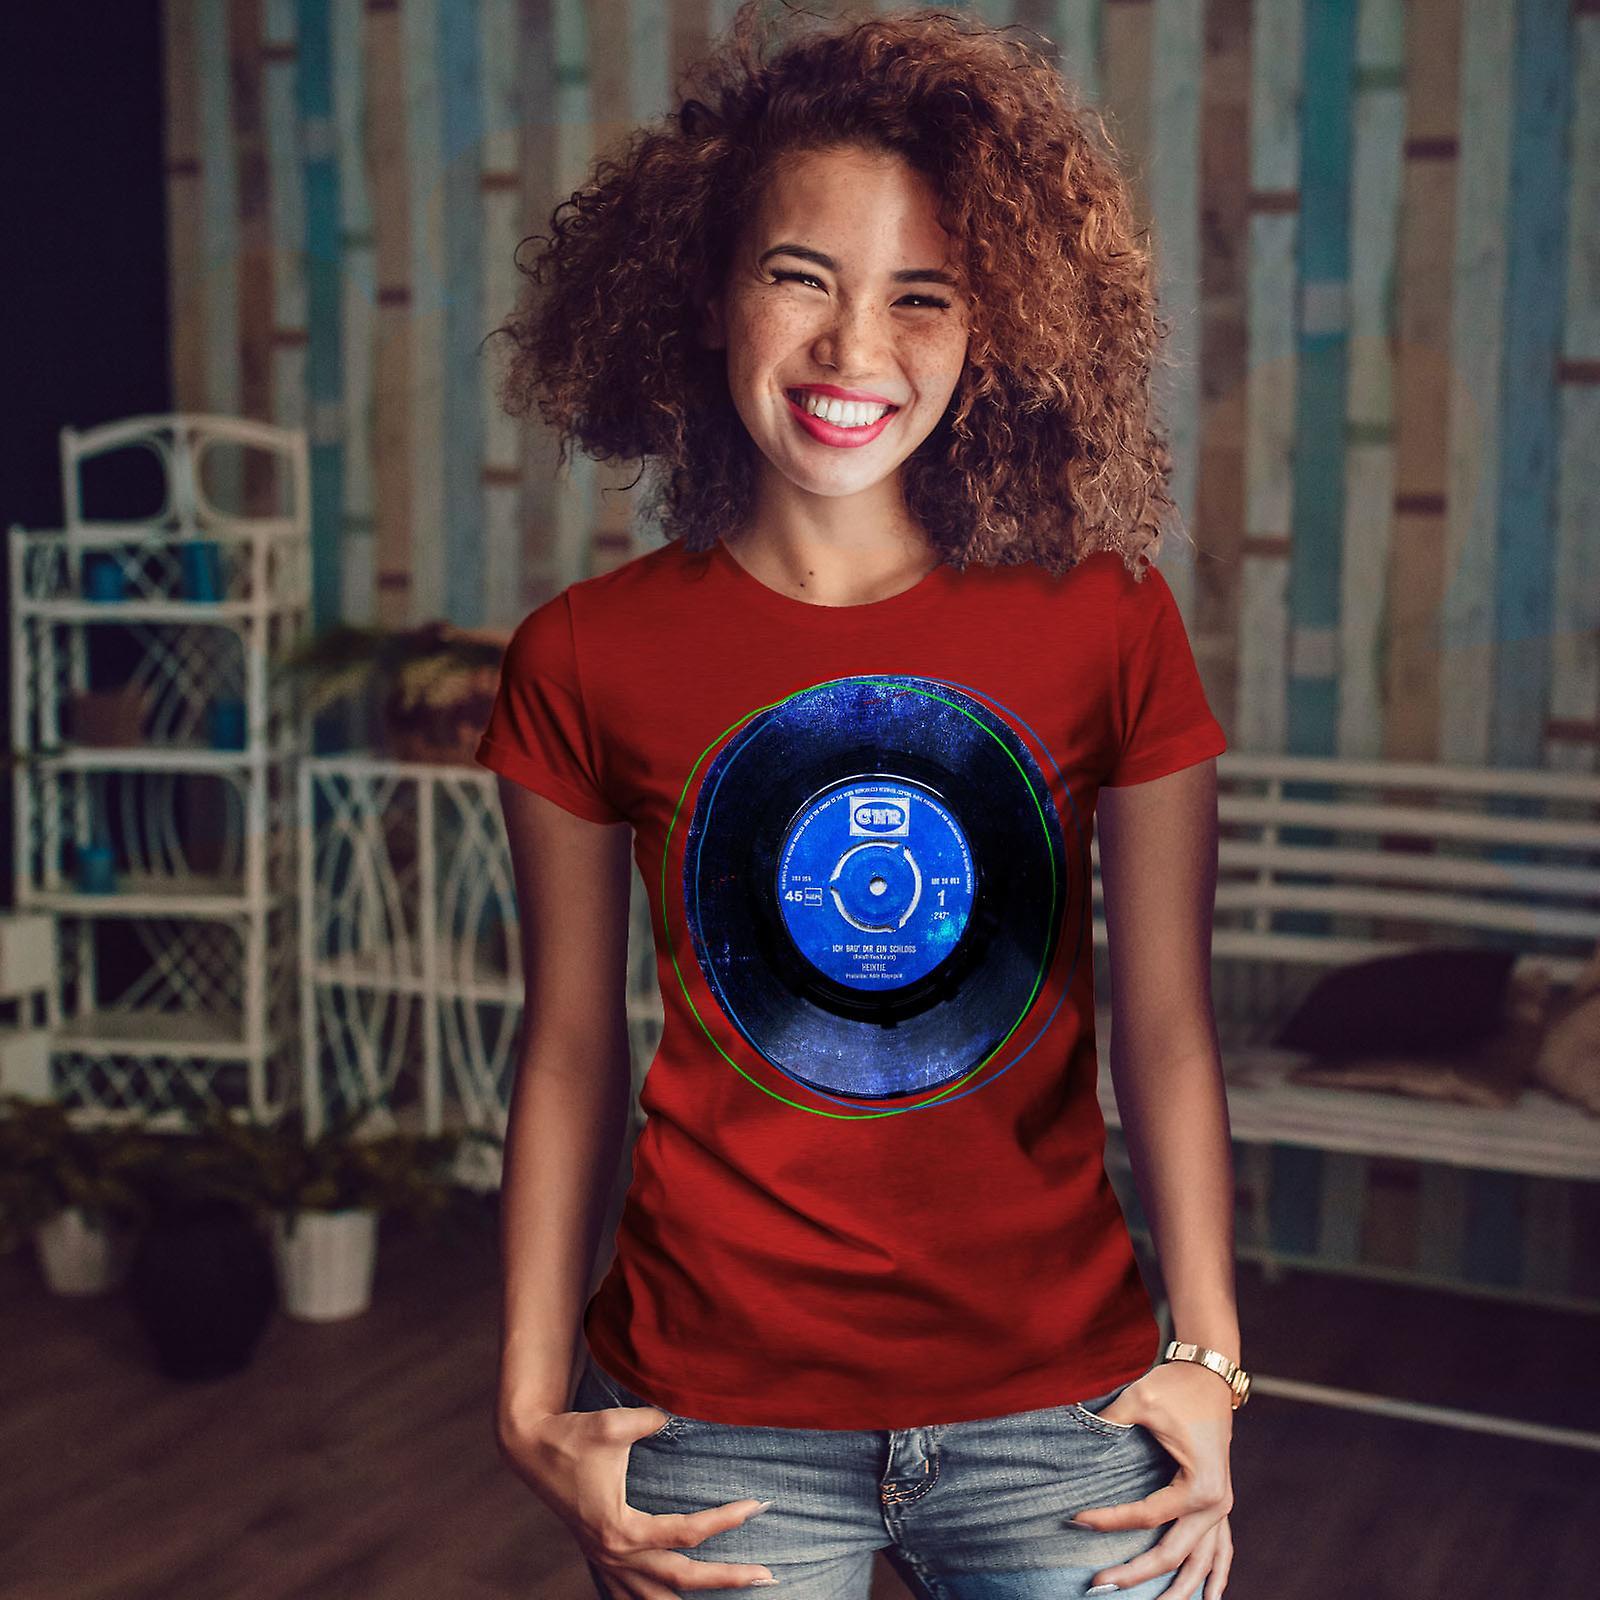 VYNYL Beat Dance musique RedT-chemise femme | Wellcoda